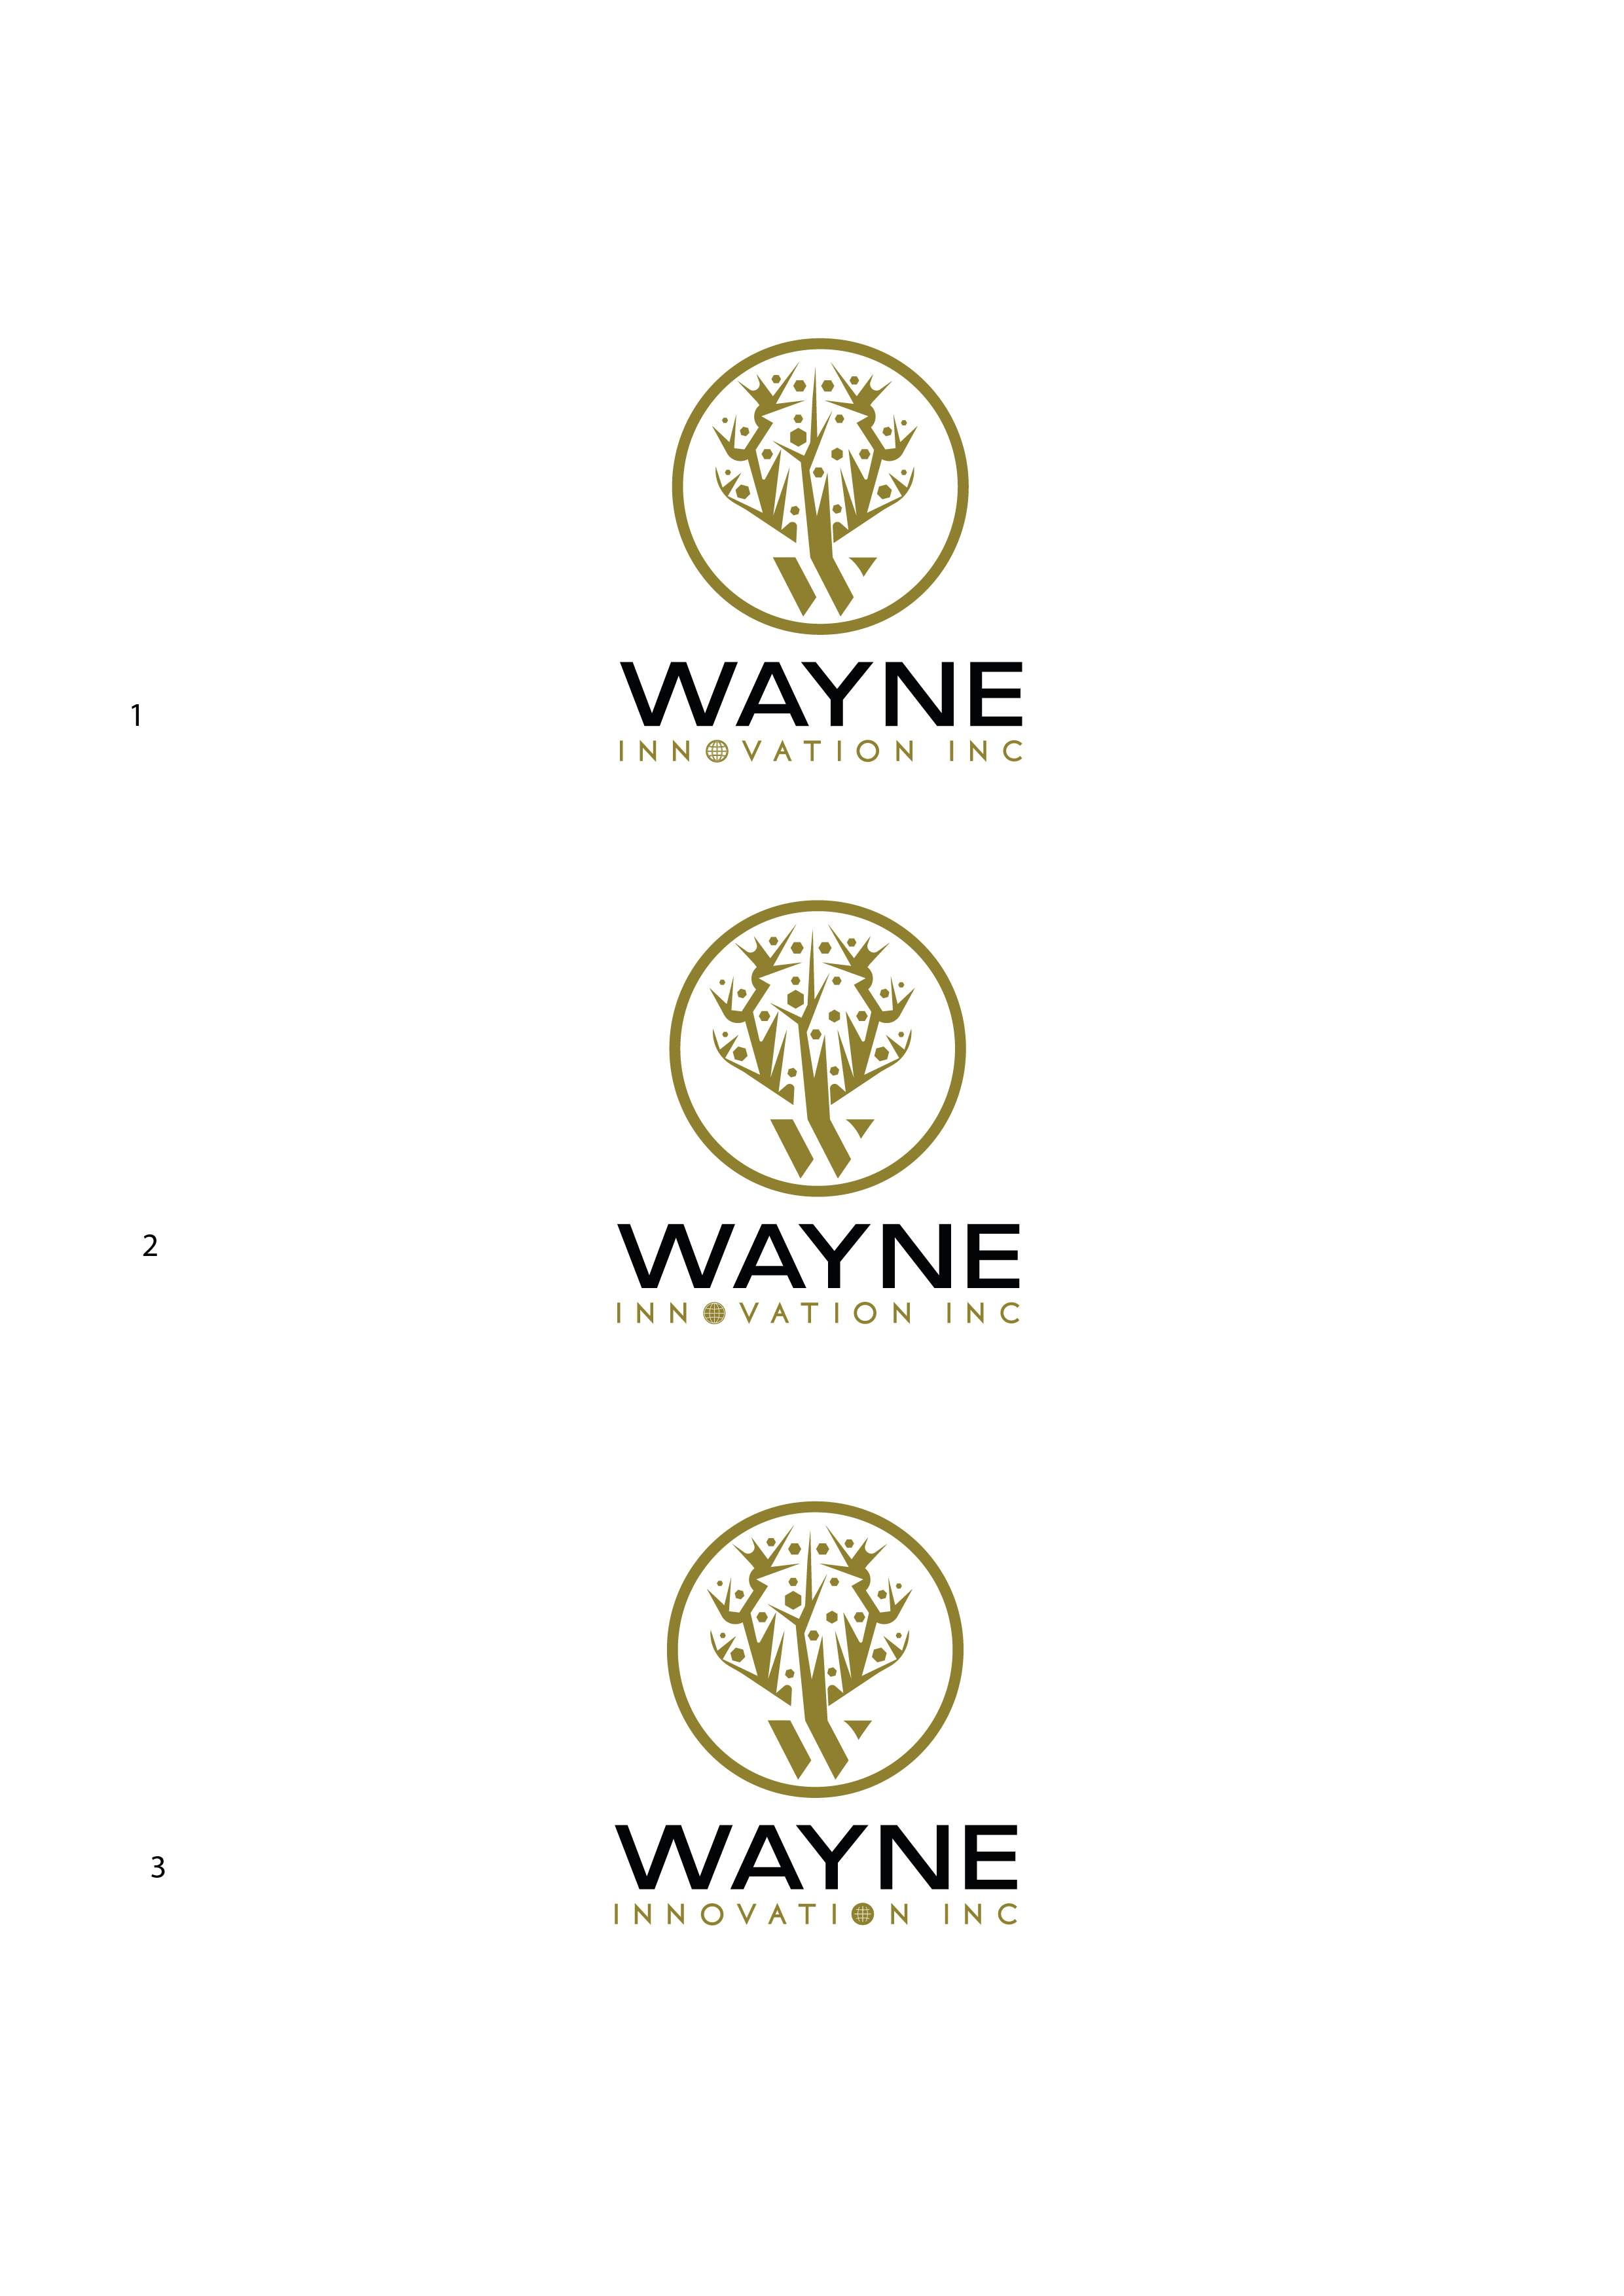 Bruce Wayne/Batman needs logo for Wayne Innovation